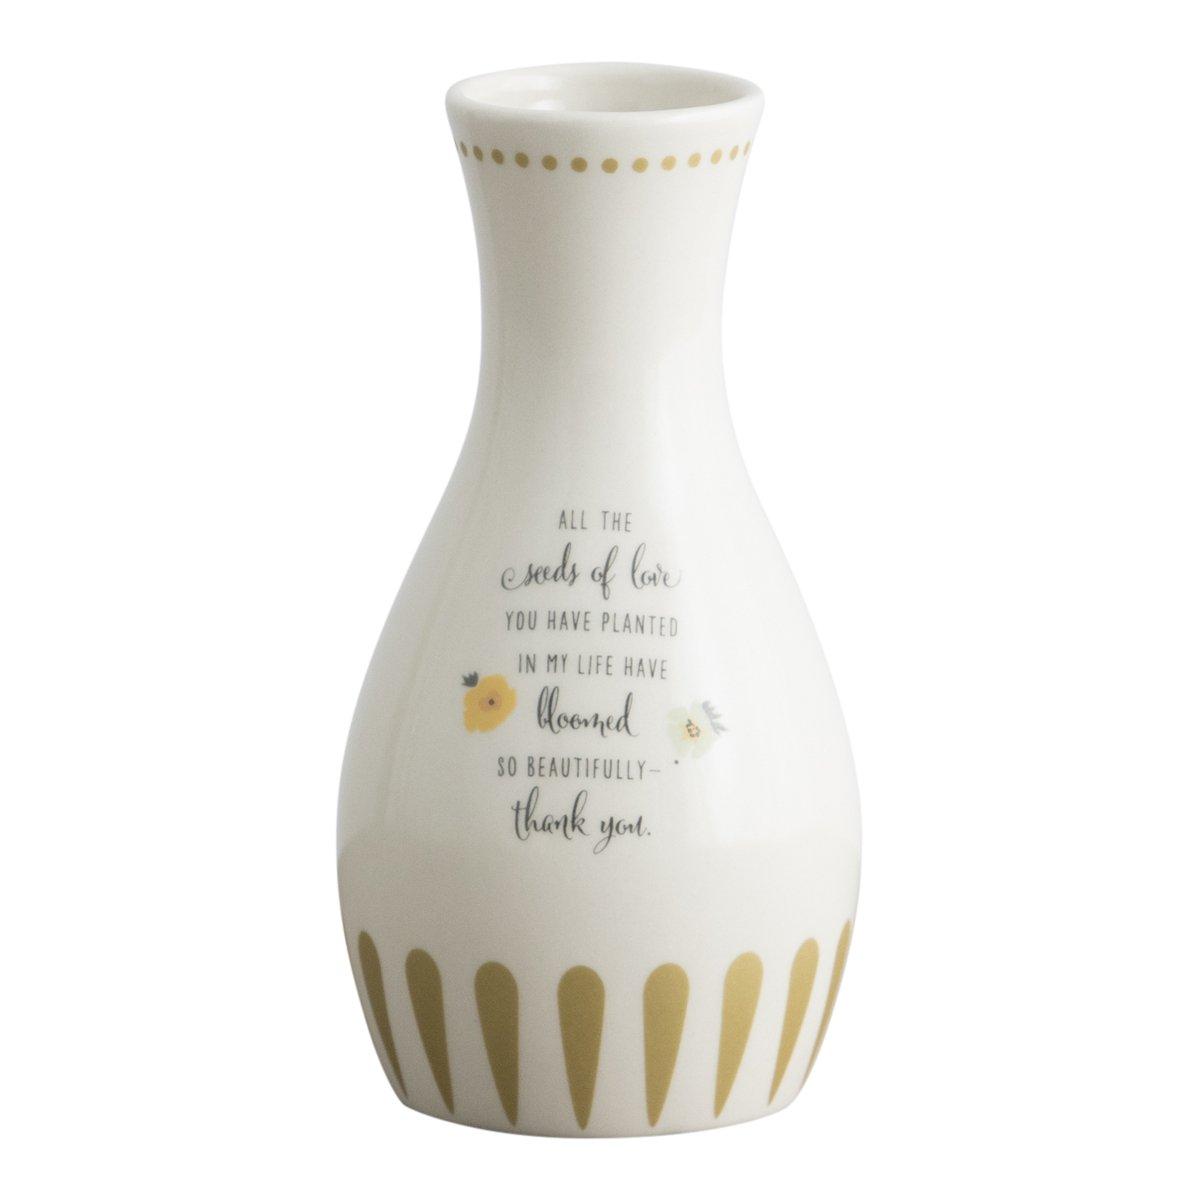 Dayspring Seeds of Love - Ceramic Bud Vase by Dayspring